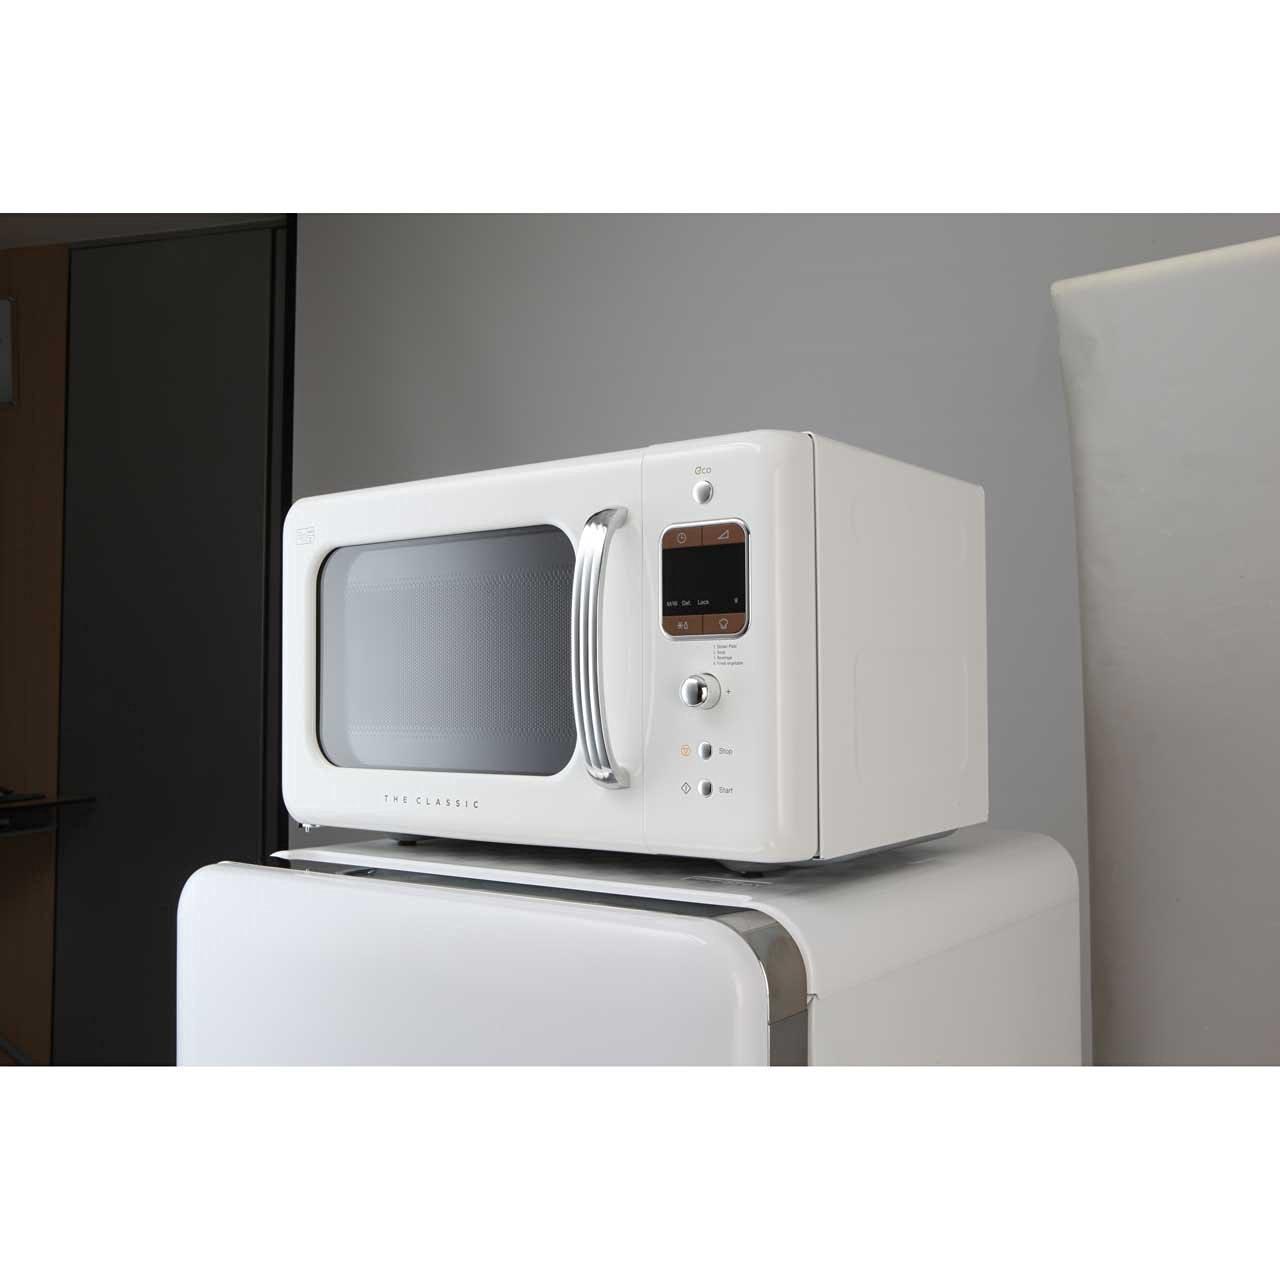 Creme White Daewoo Small Retro Microwave Oven White